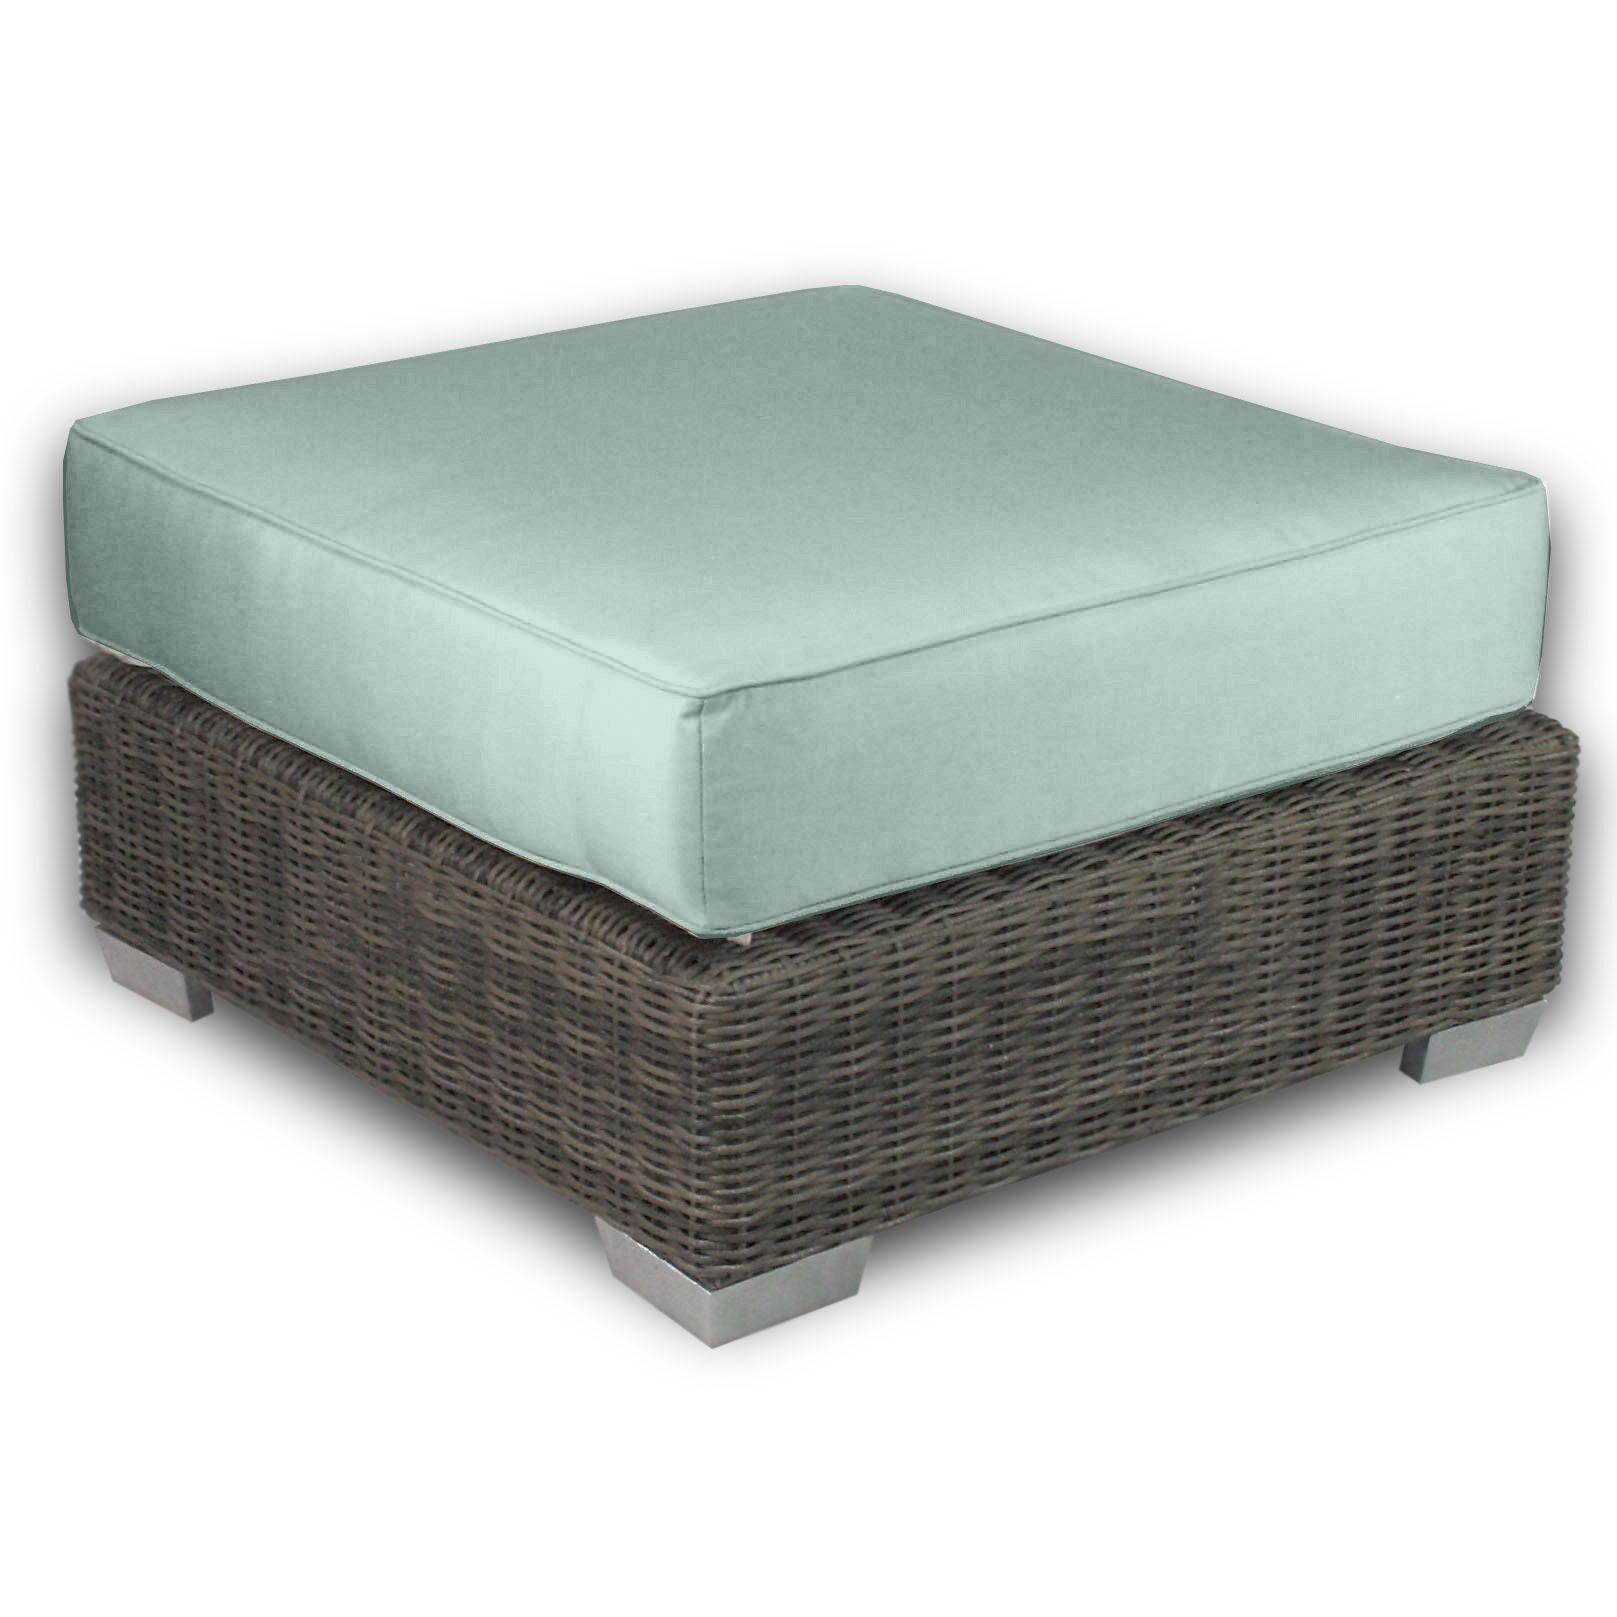 Palisades Ottoman with Cushion Fabric: Mist